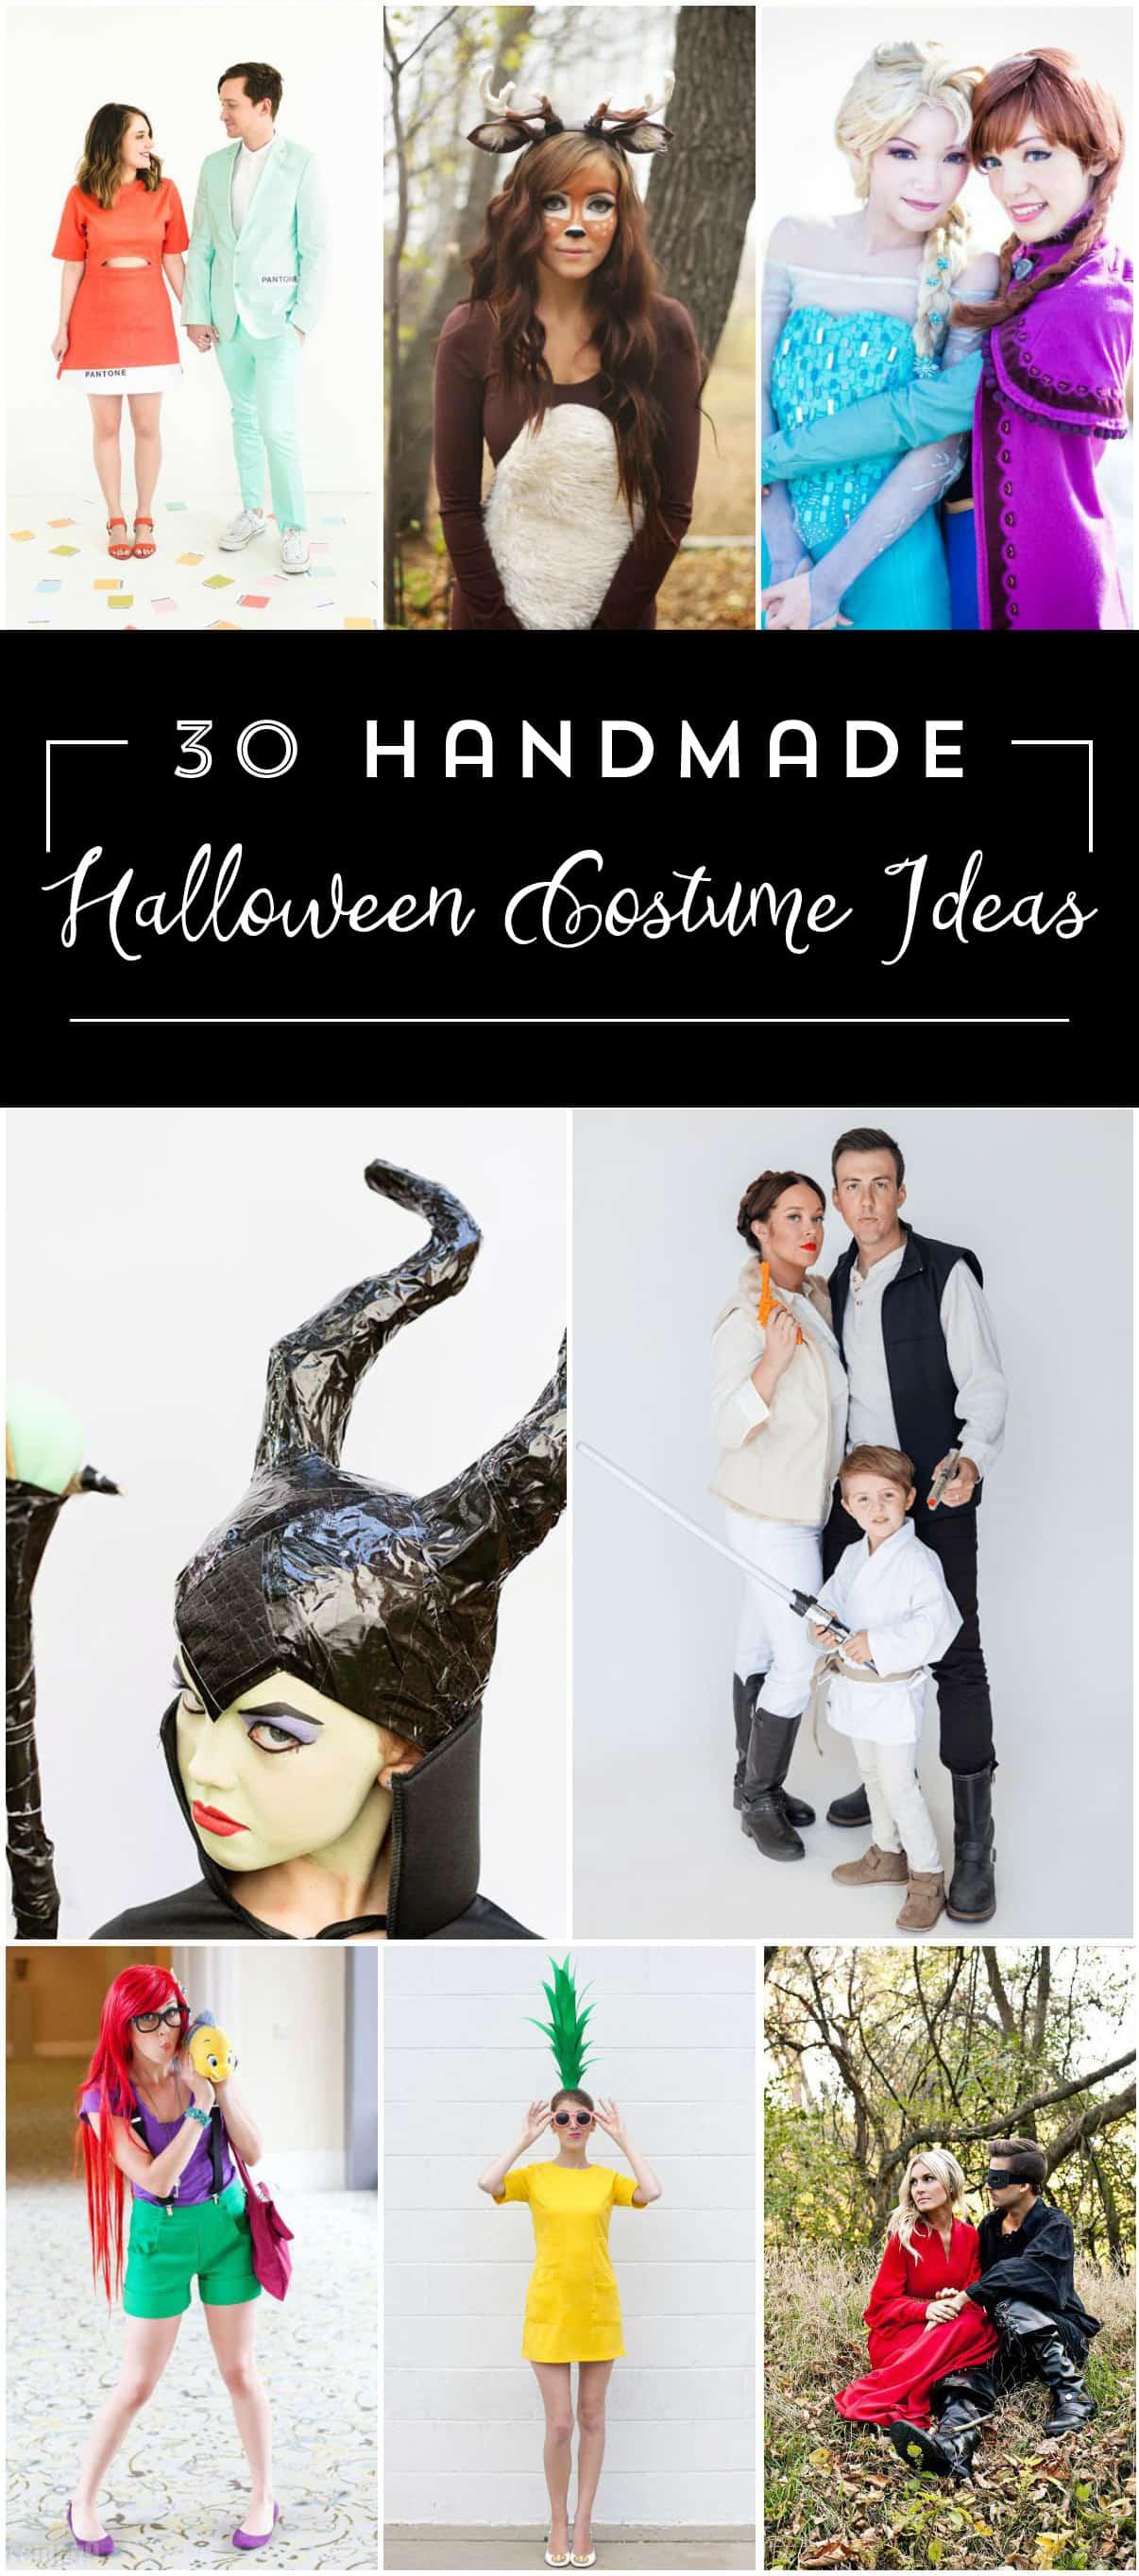 30 Handmade Halloween Costume Ideas